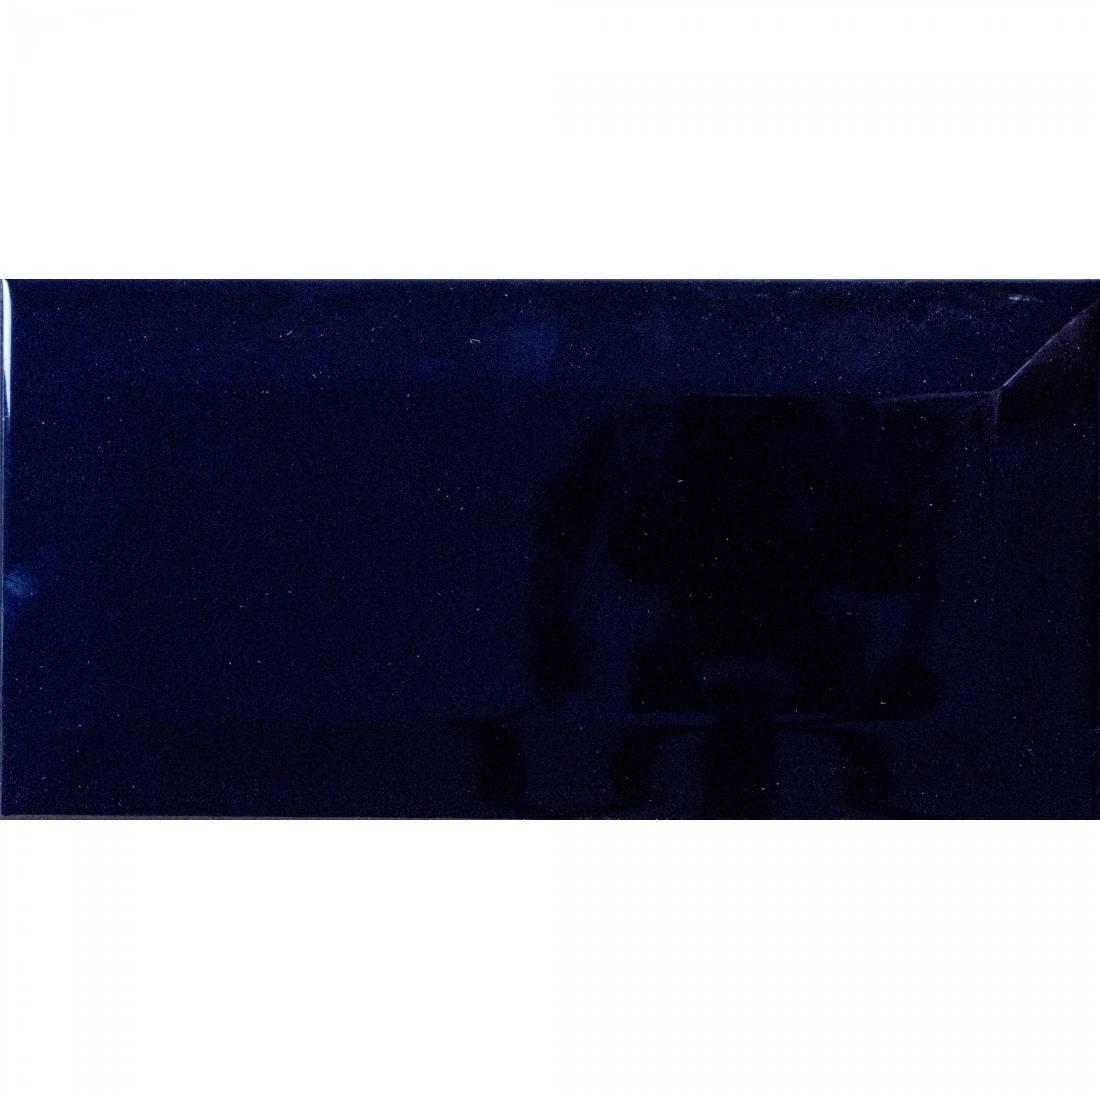 Bevelled 10x20 Black Gloss 1